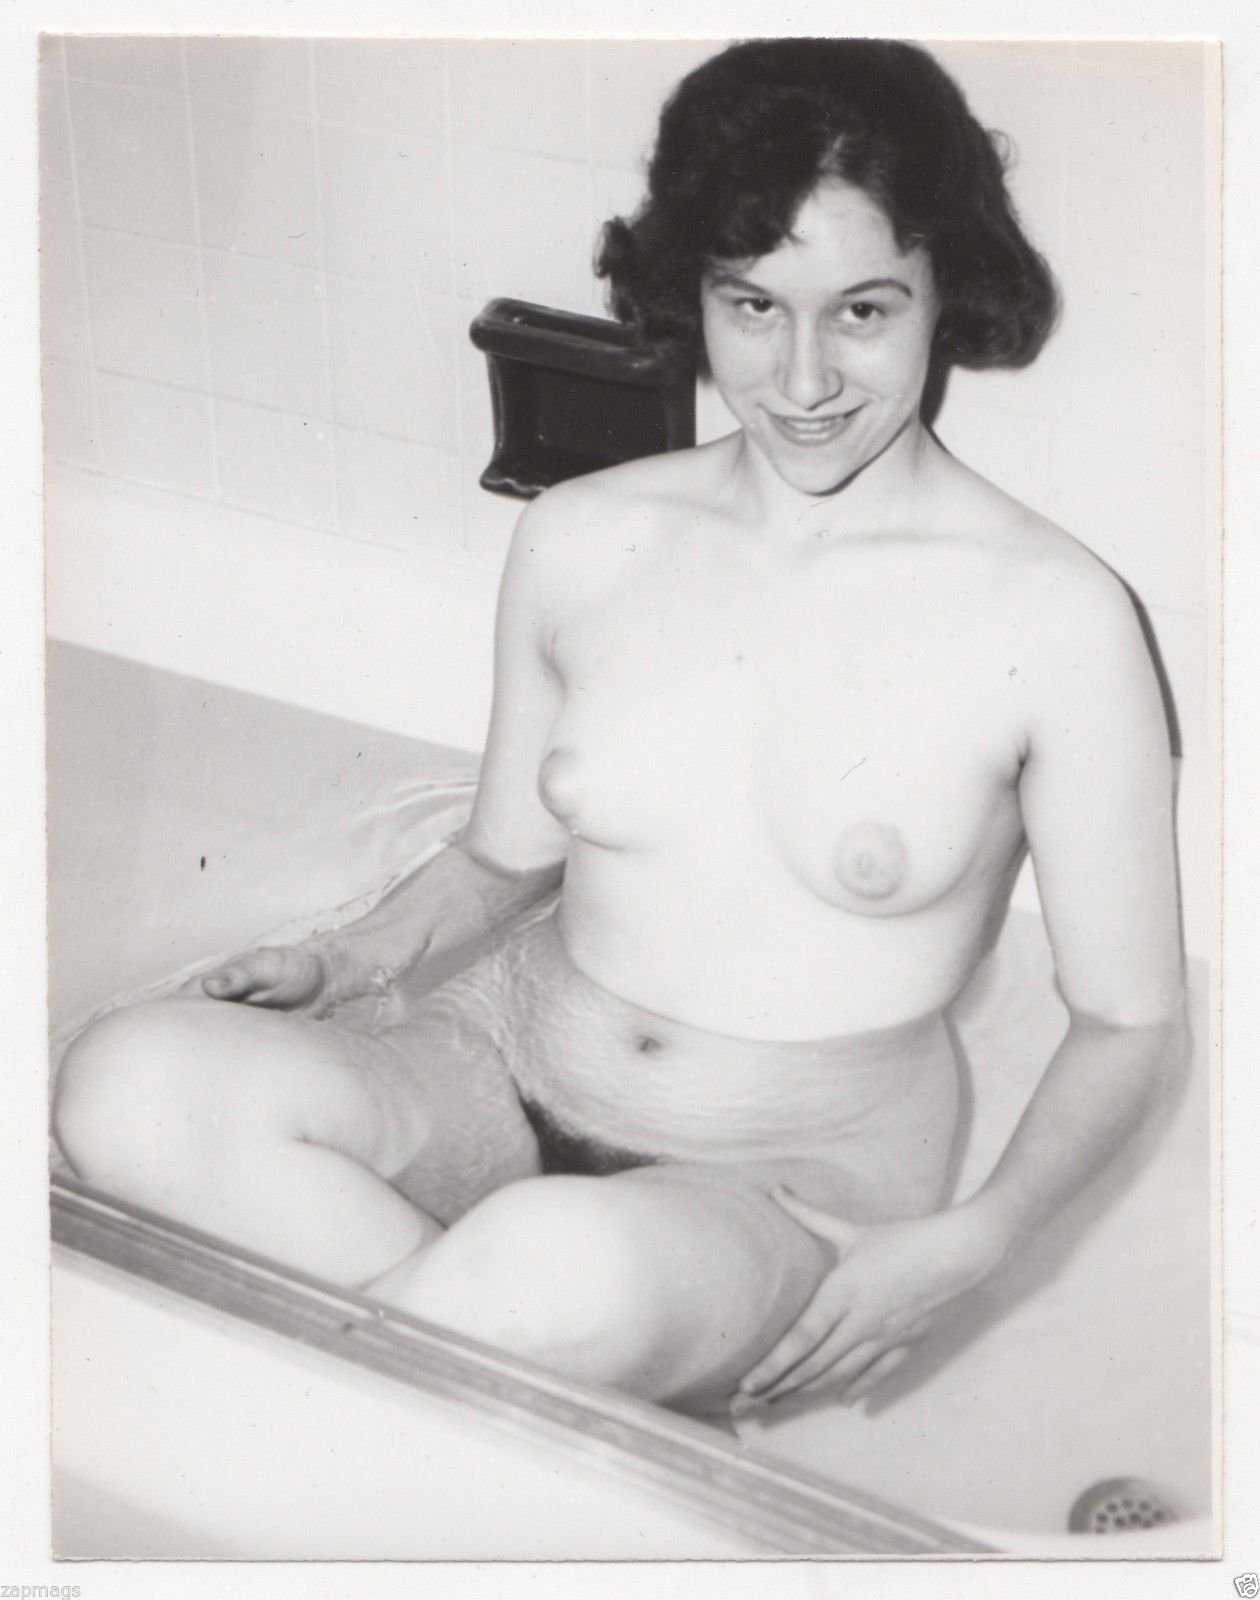 Rub a dub dub, gorgeous retro nude chick in the tub.